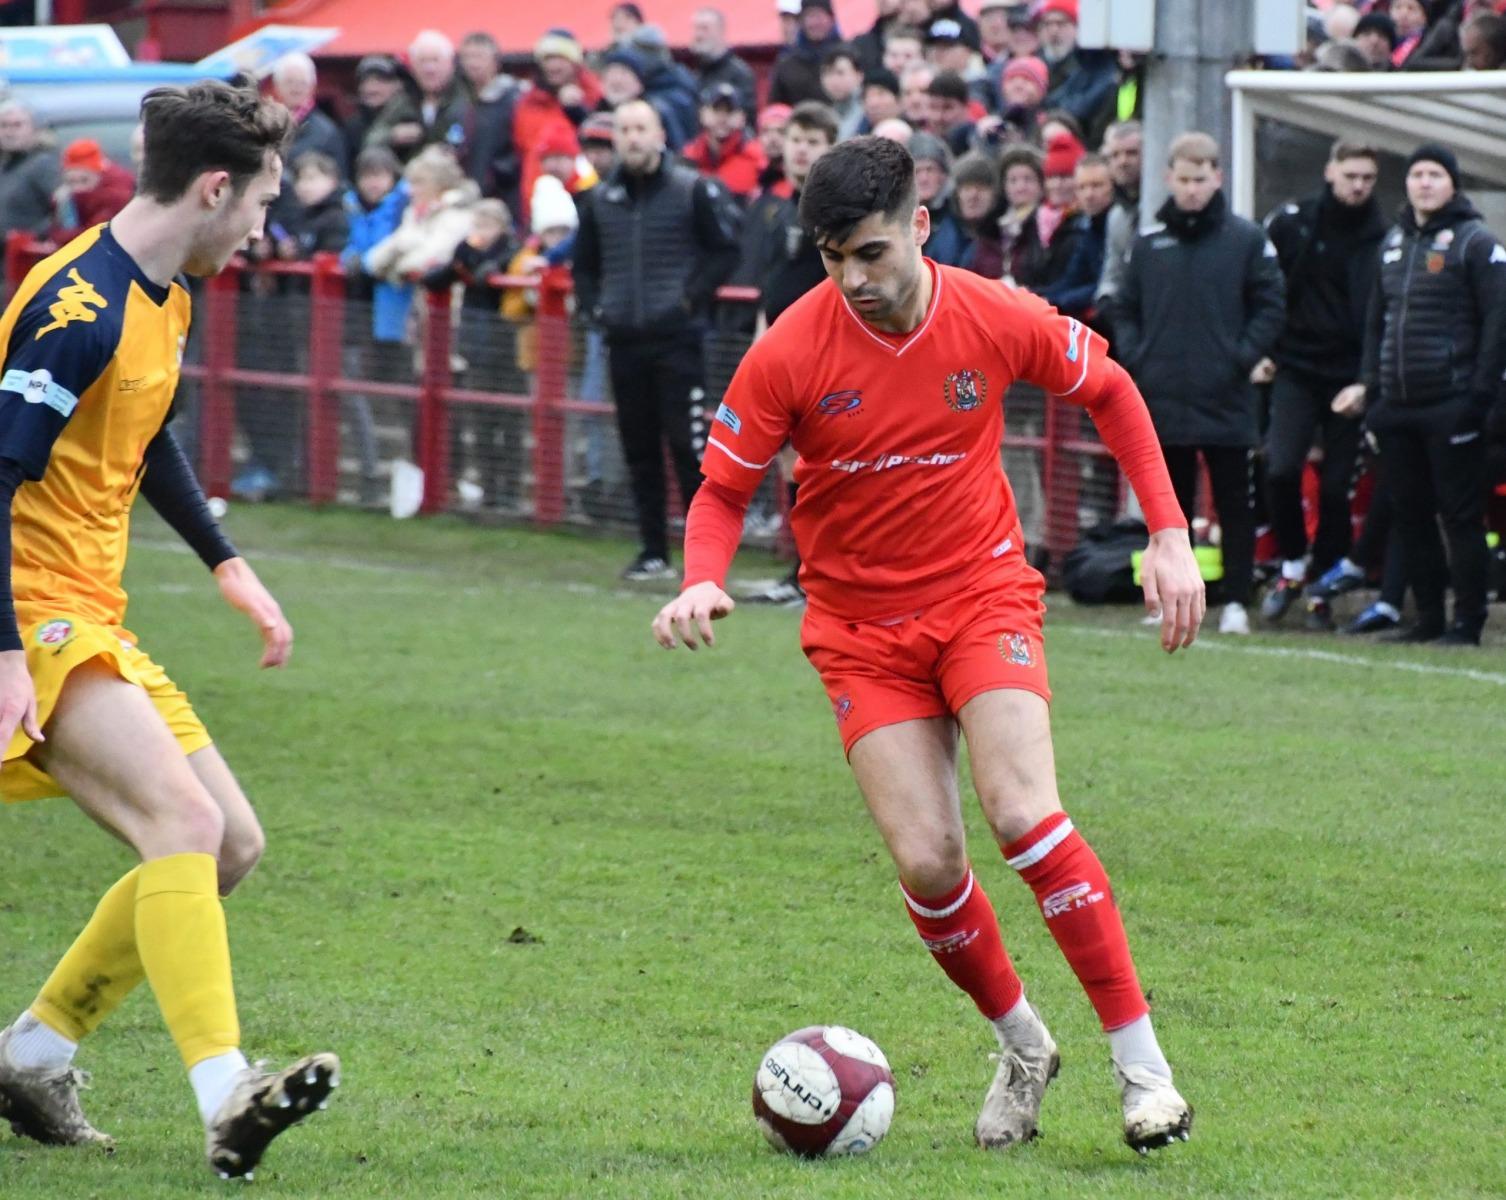 Workington-Reds-v-Trafford-Ben-Challis-5-scaled